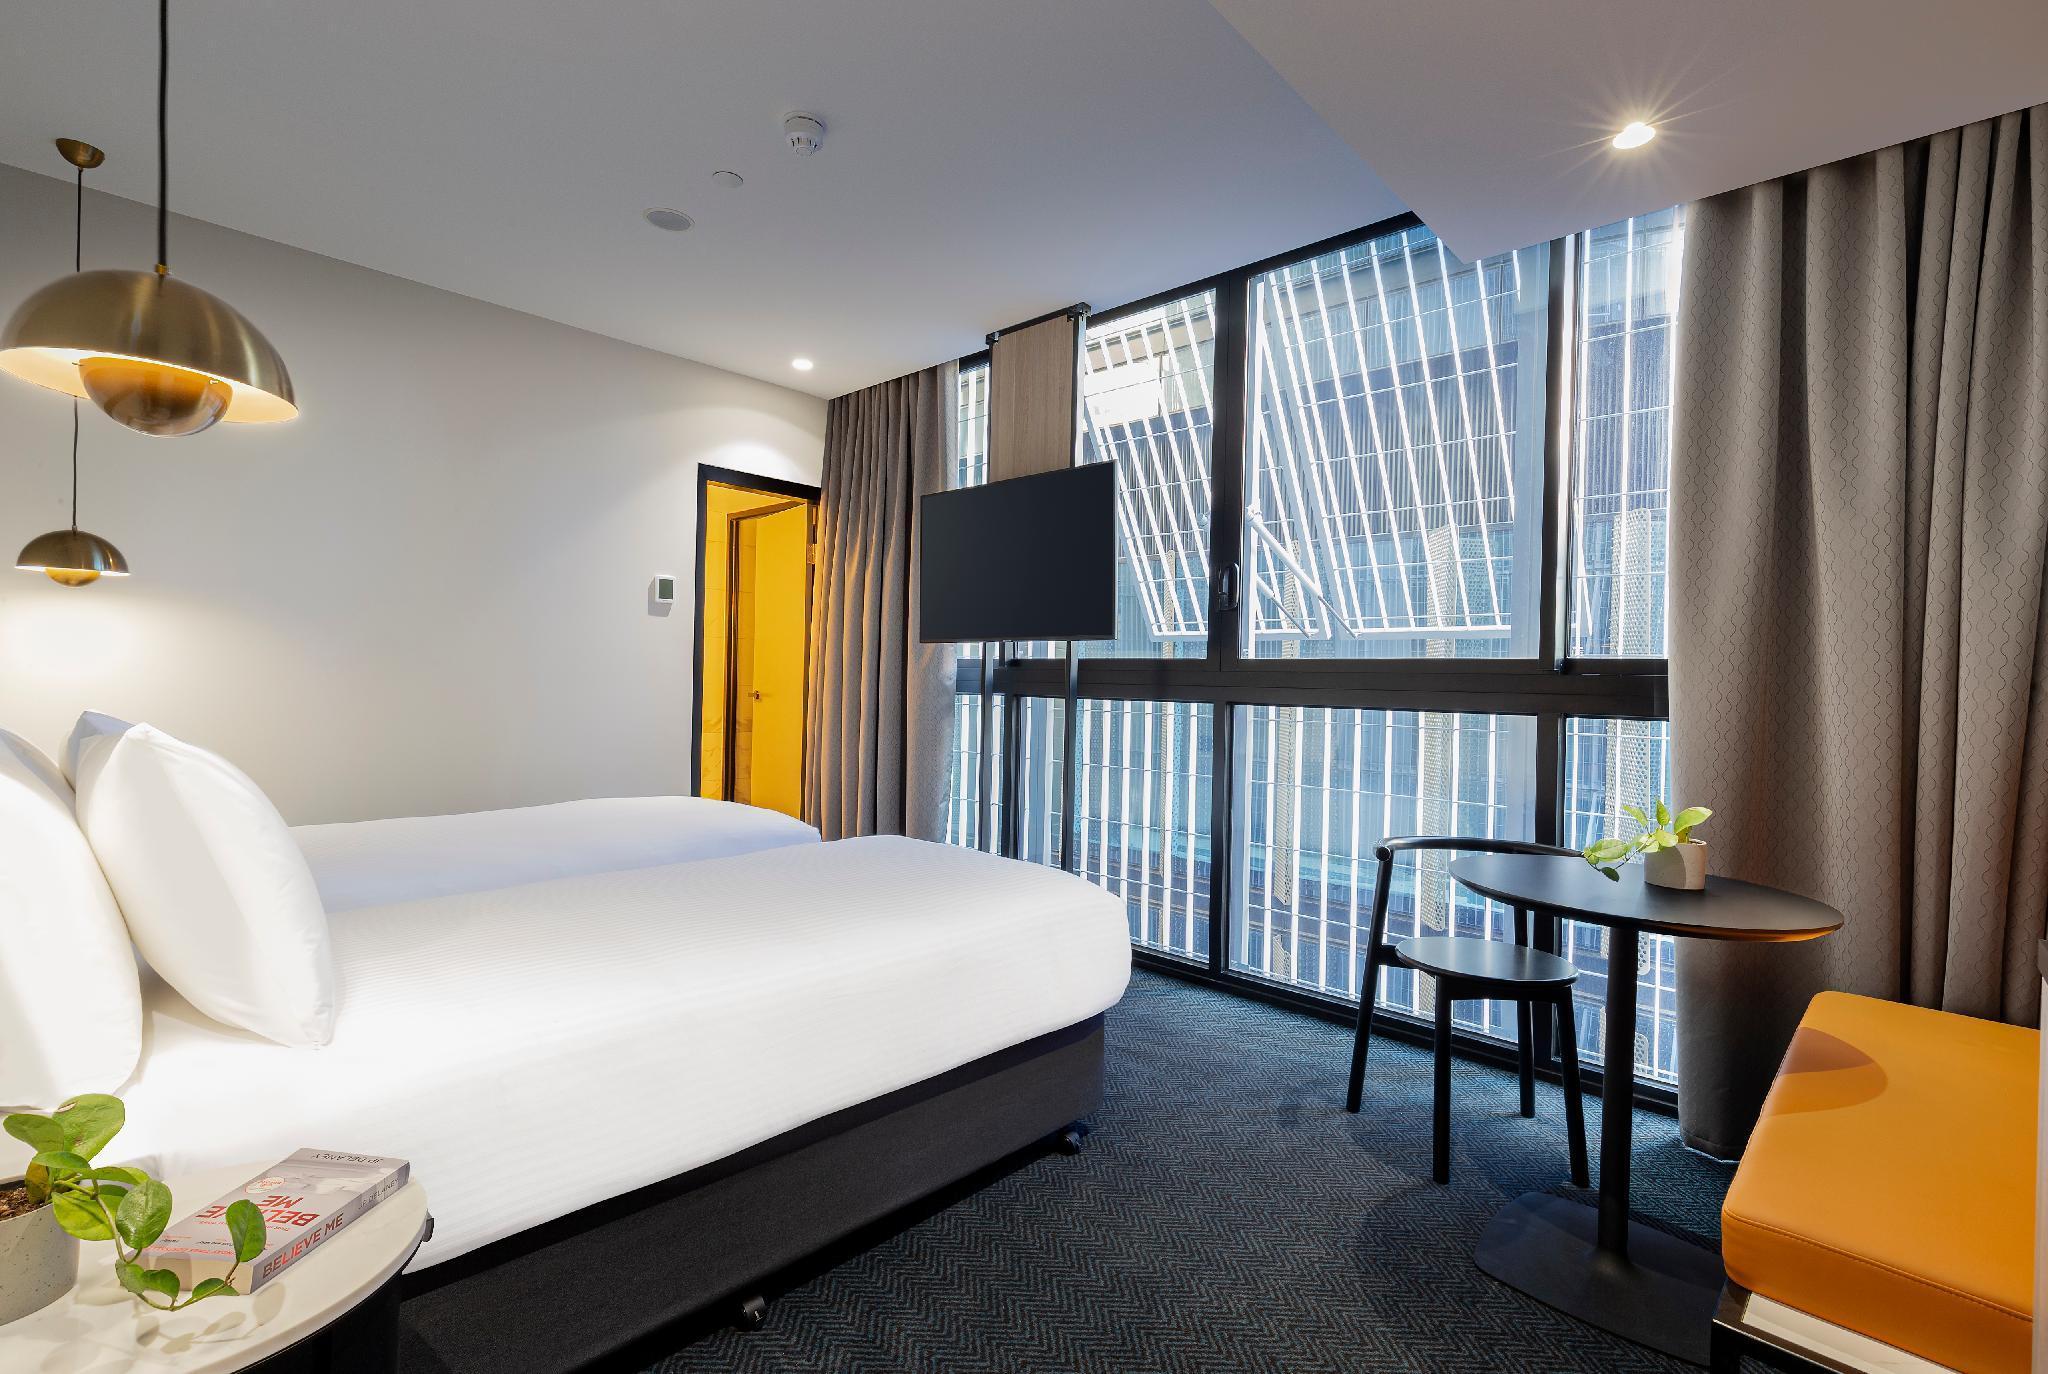 Outstanding Brady Hotels Jones Lane In Melbourne Room Deals Photos Interior Design Ideas Tzicisoteloinfo